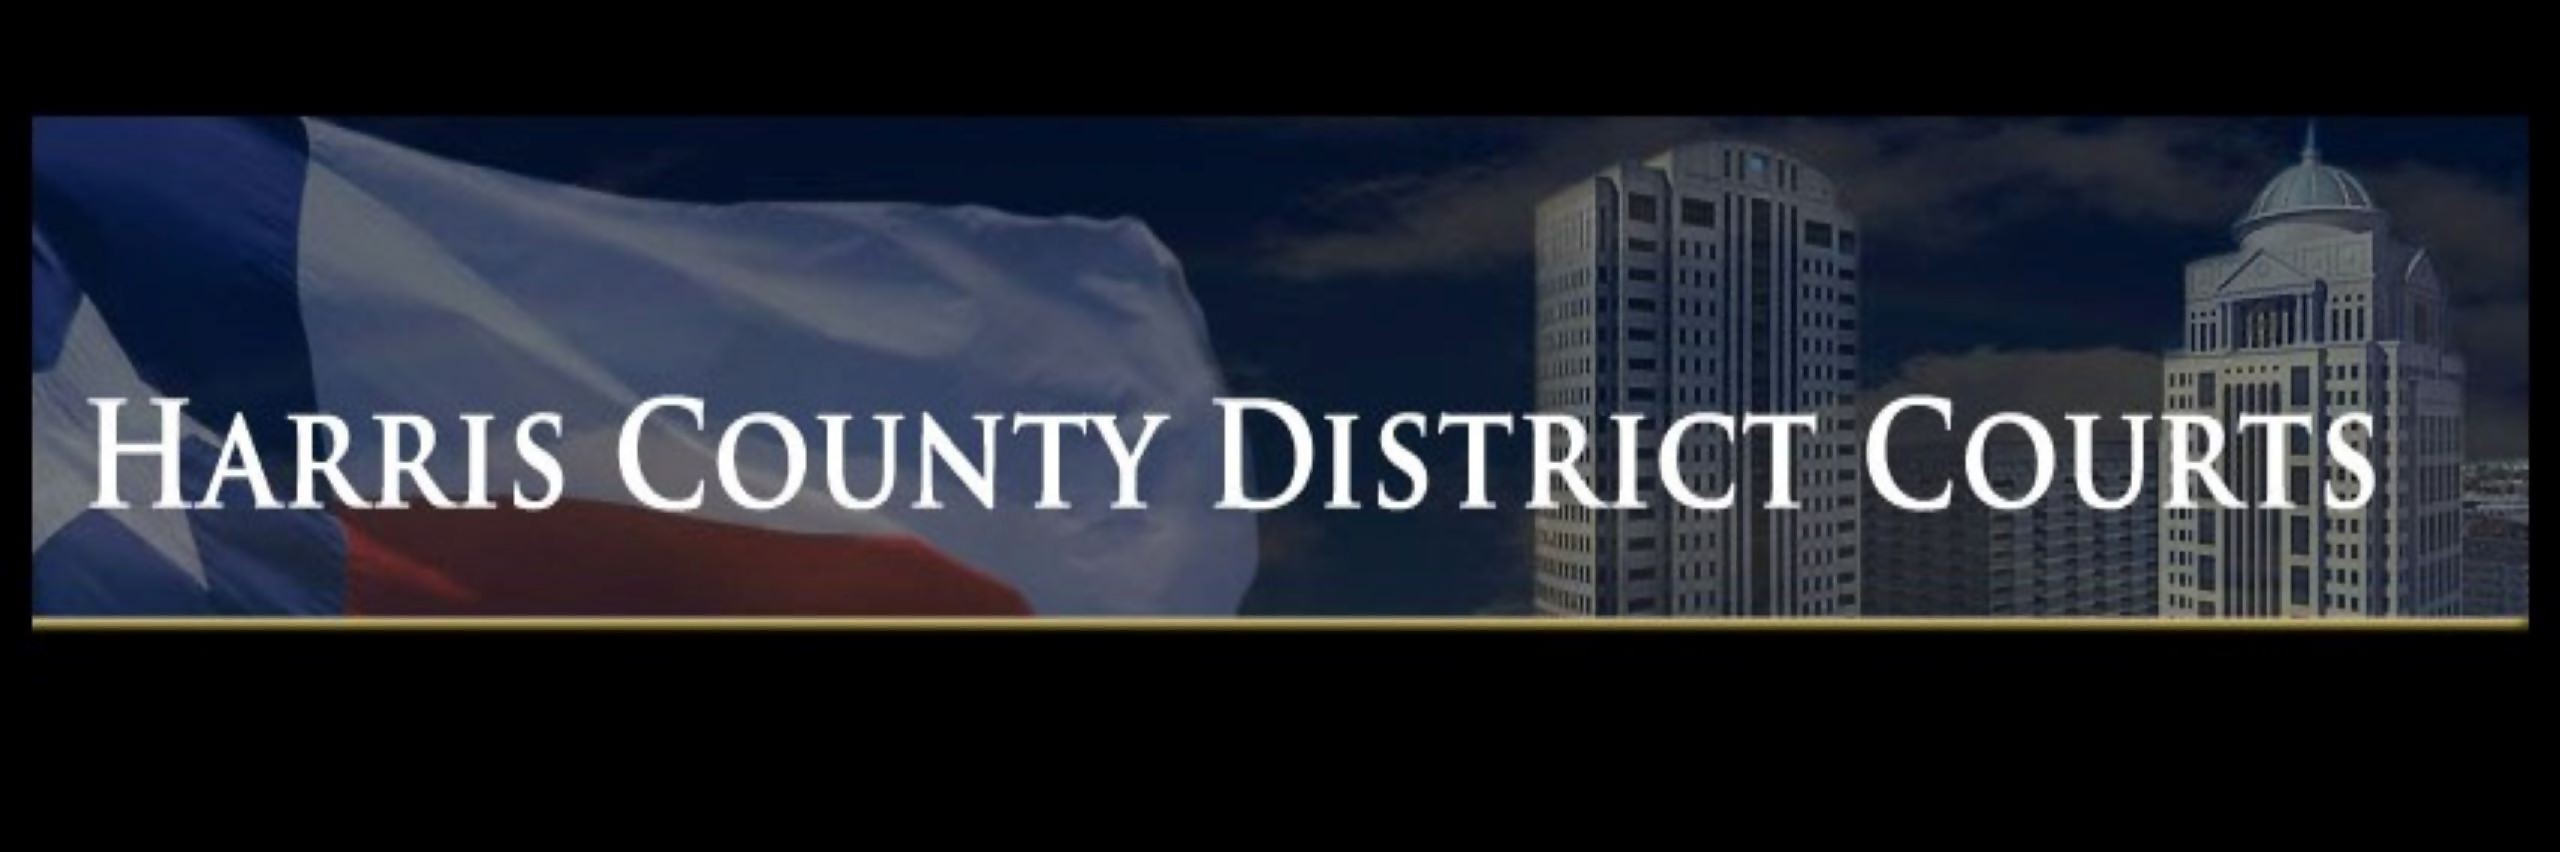 246th District Court AJ - Live Stream